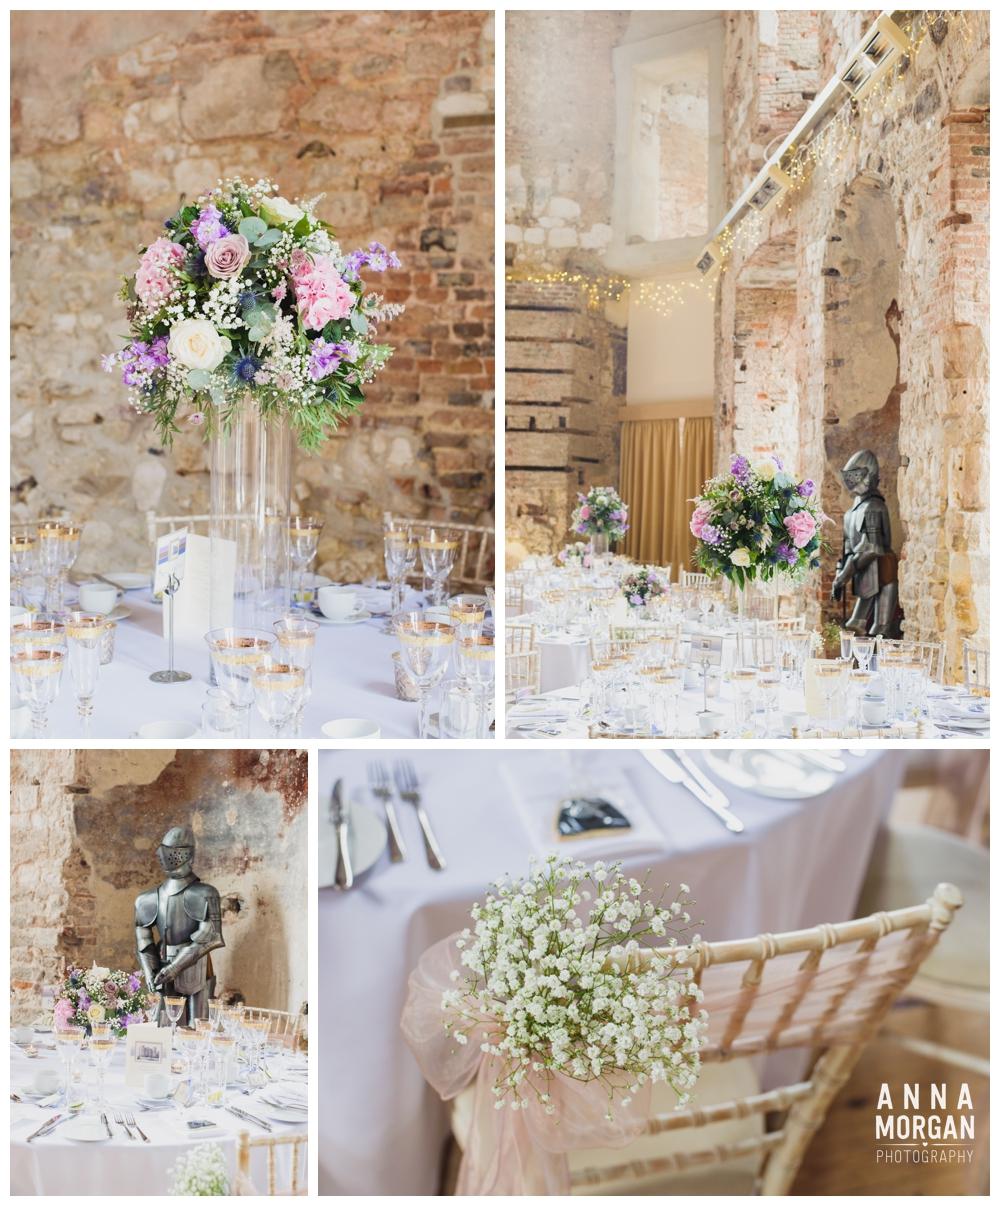 Lulworth castle wedding Anna Morgan Photography Bellisimo planners-107